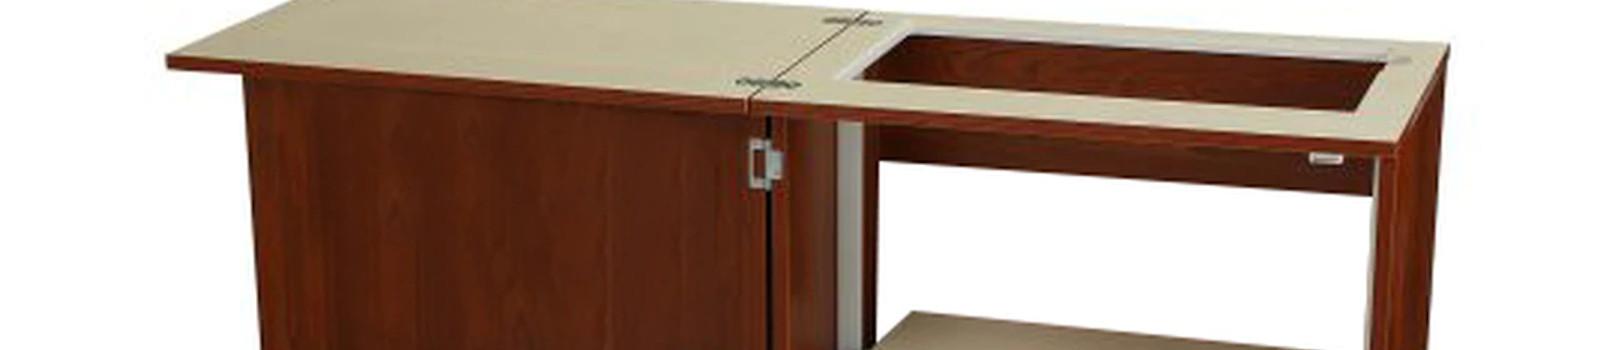 Arrow Judy Sewing Cabinet